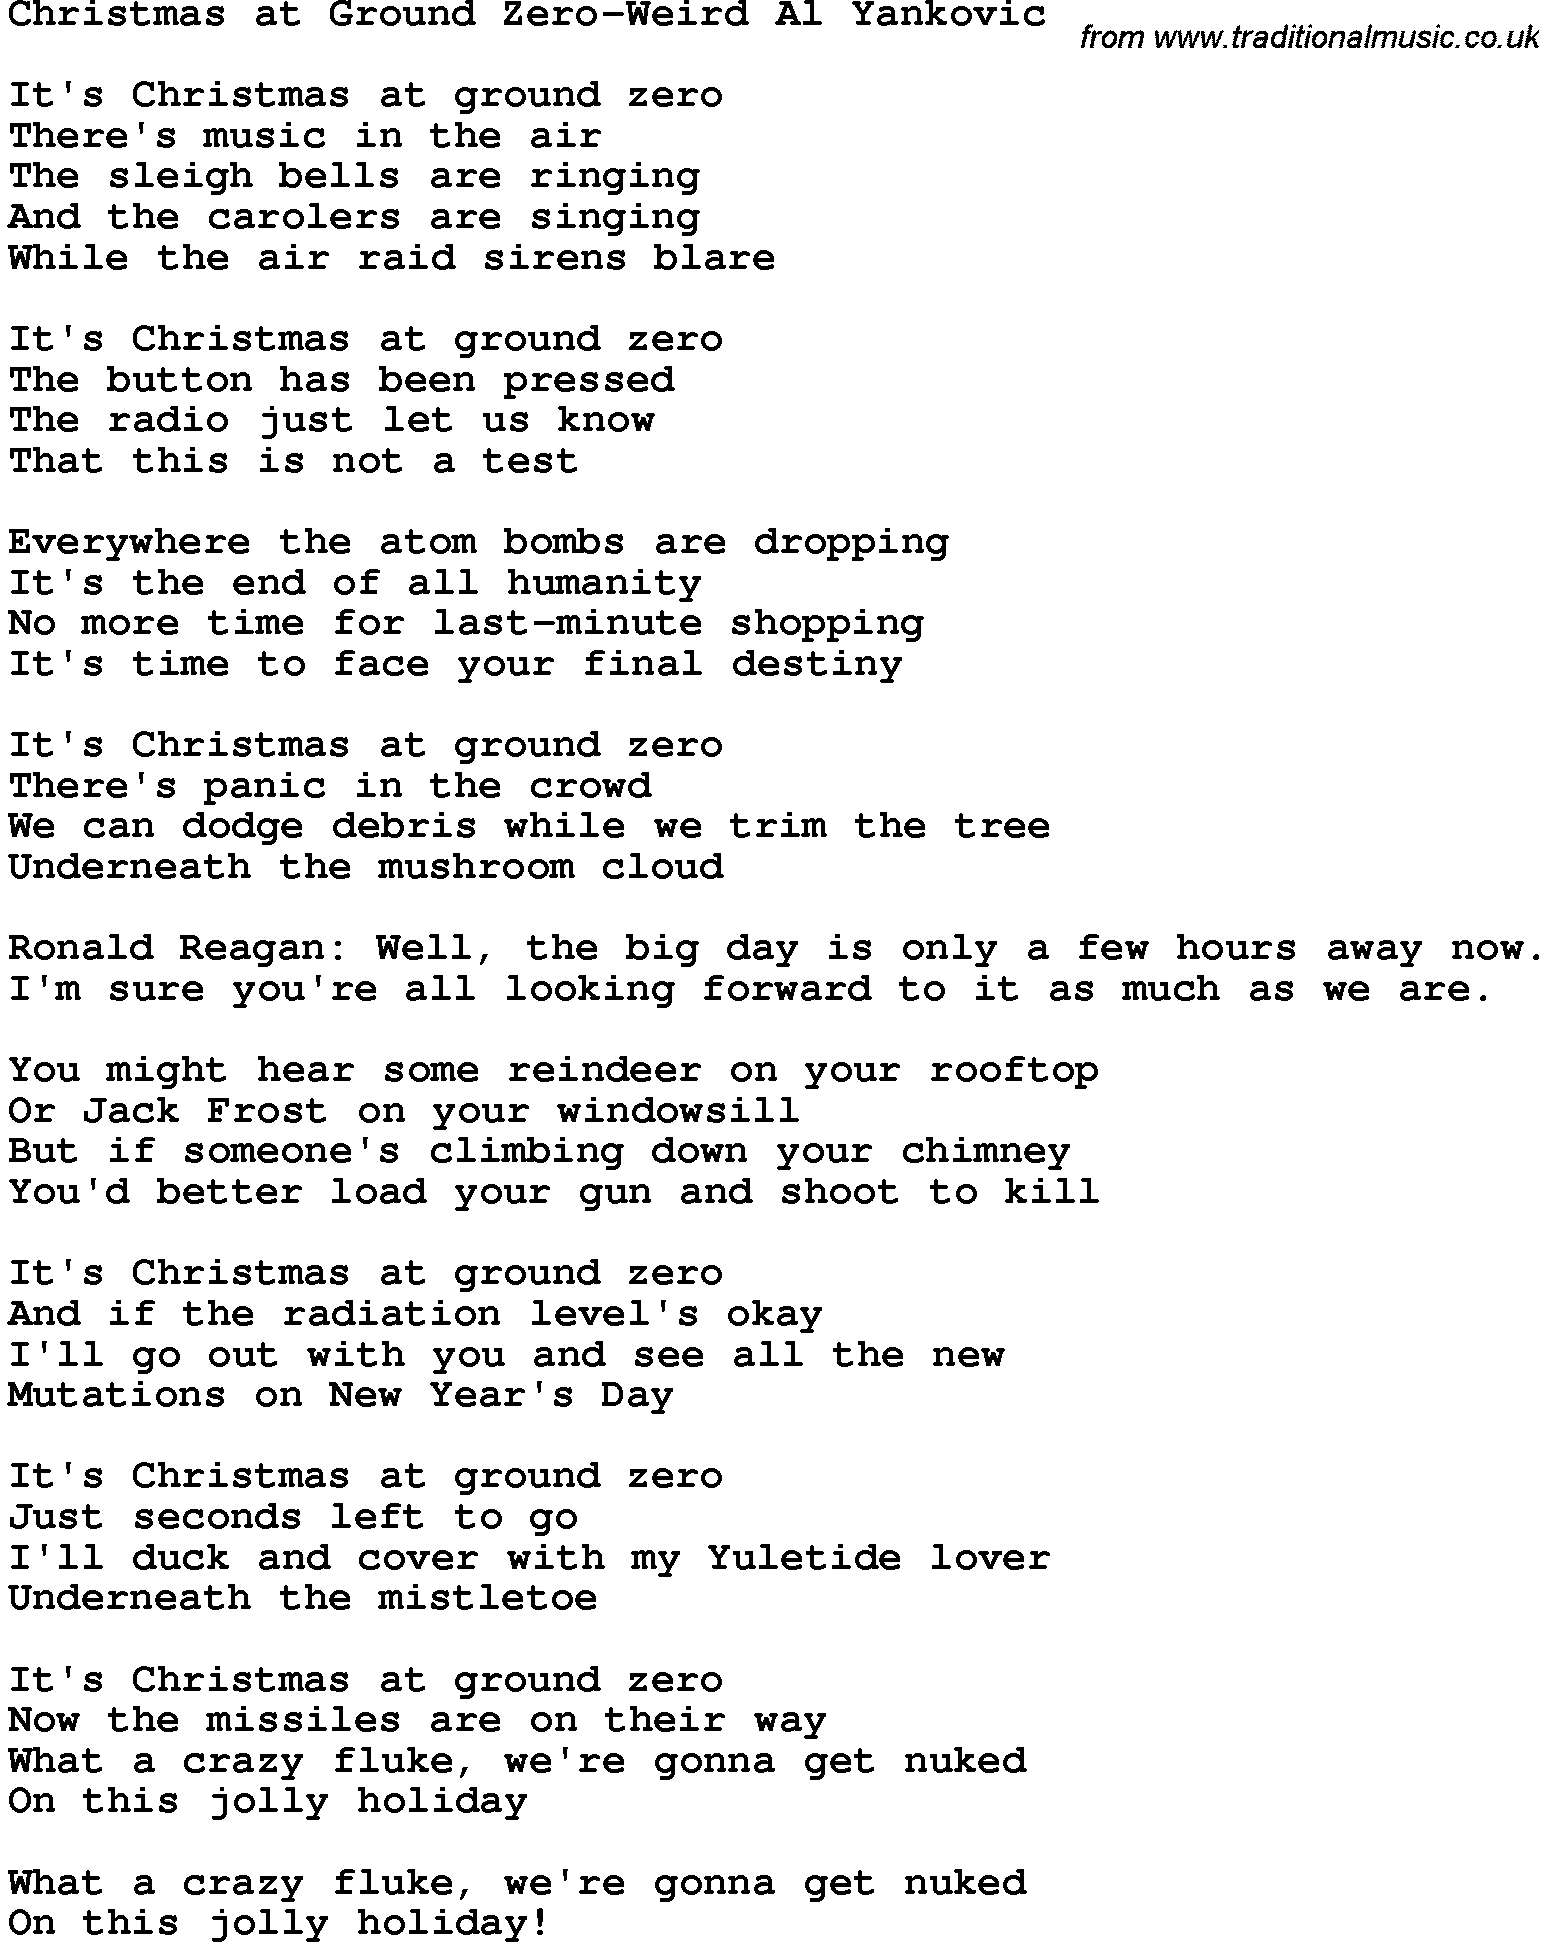 A little bit dark, these lyrics are